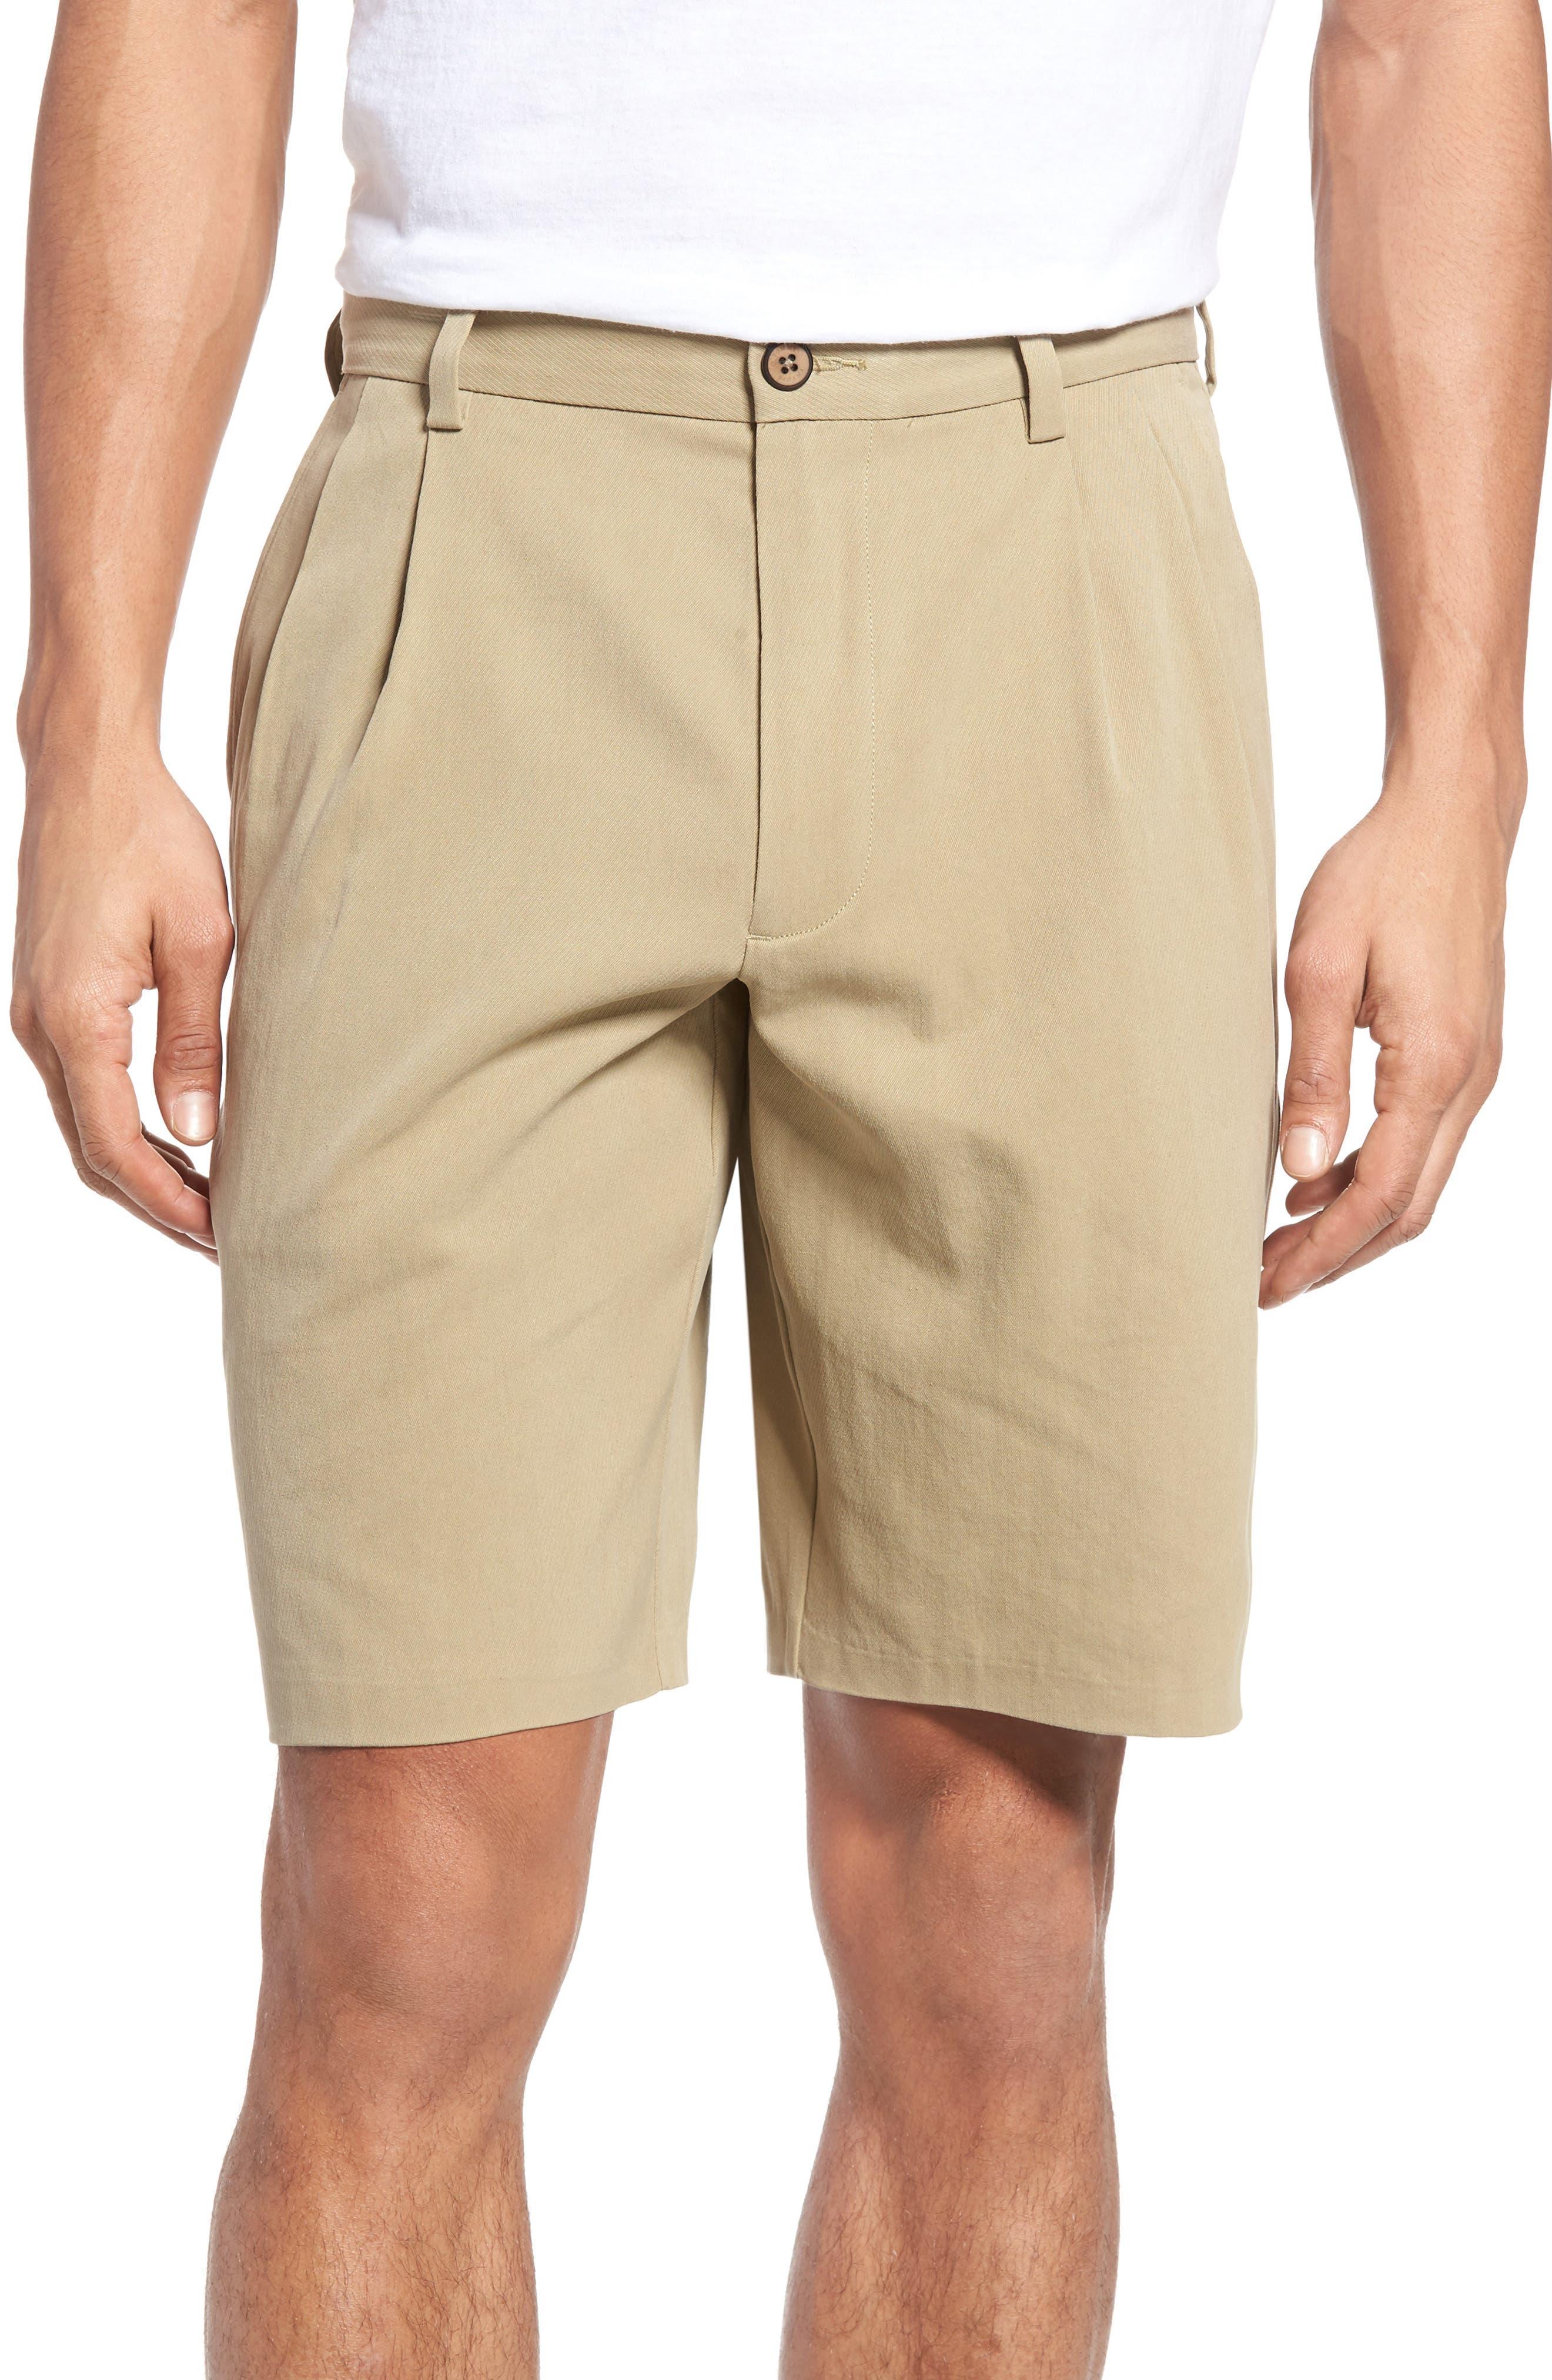 St. Thomas Pleated Shorts,                         Main,                         color, SISAL